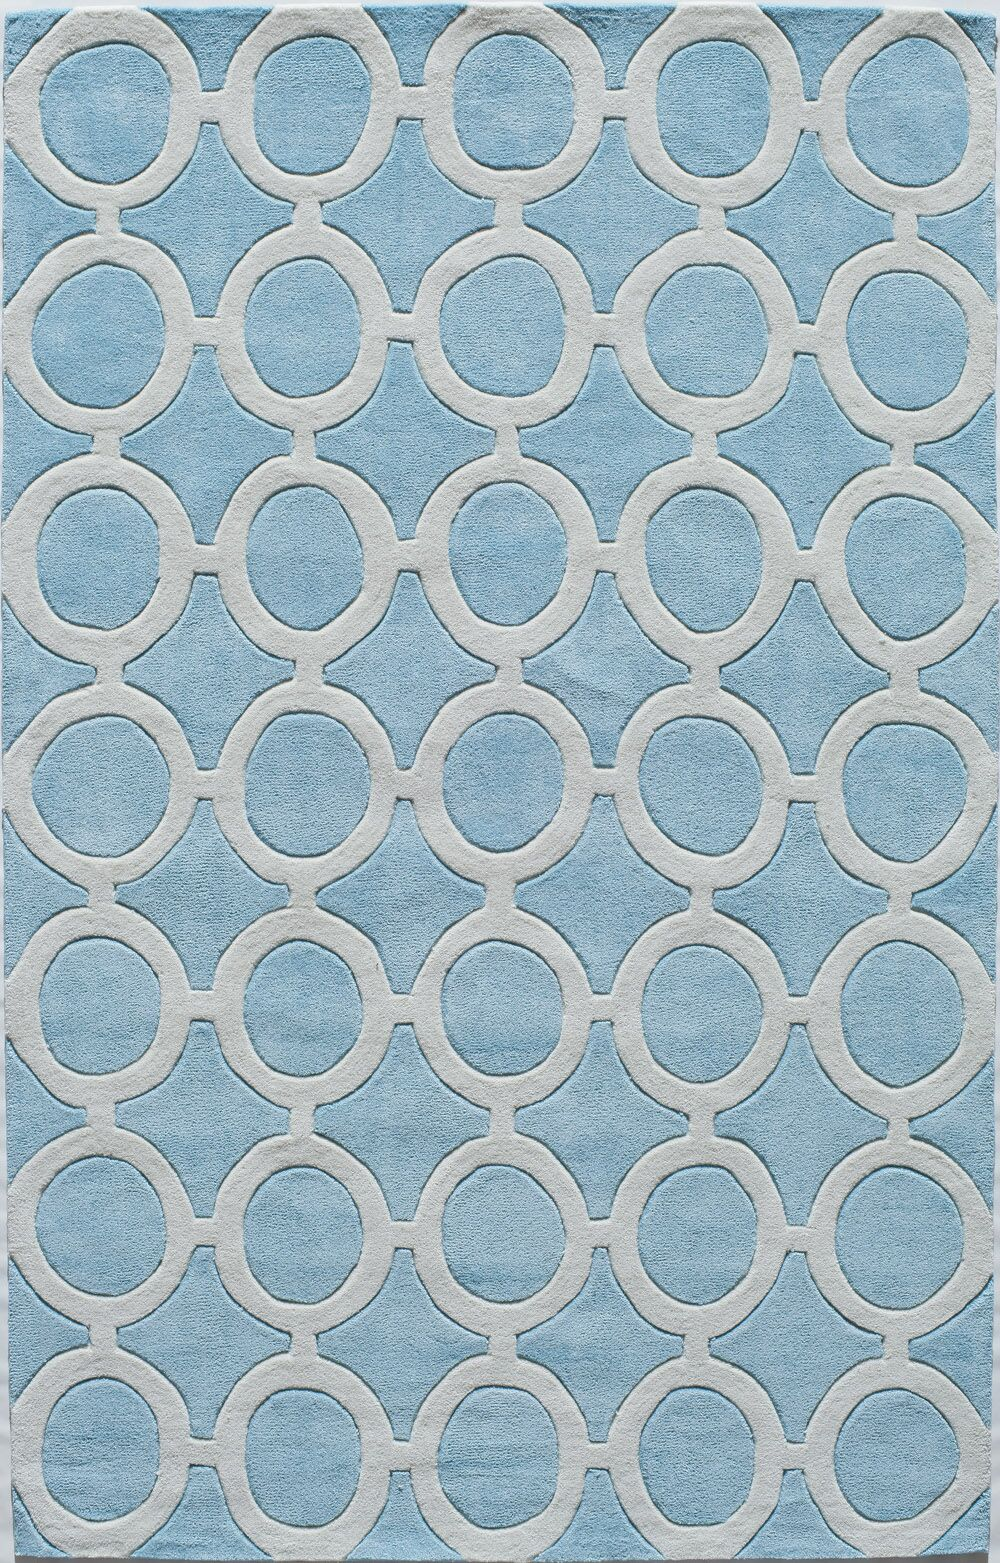 Hand-Tufted Light Blue Area Rug Rug Size: Rectangle 8' x 10'